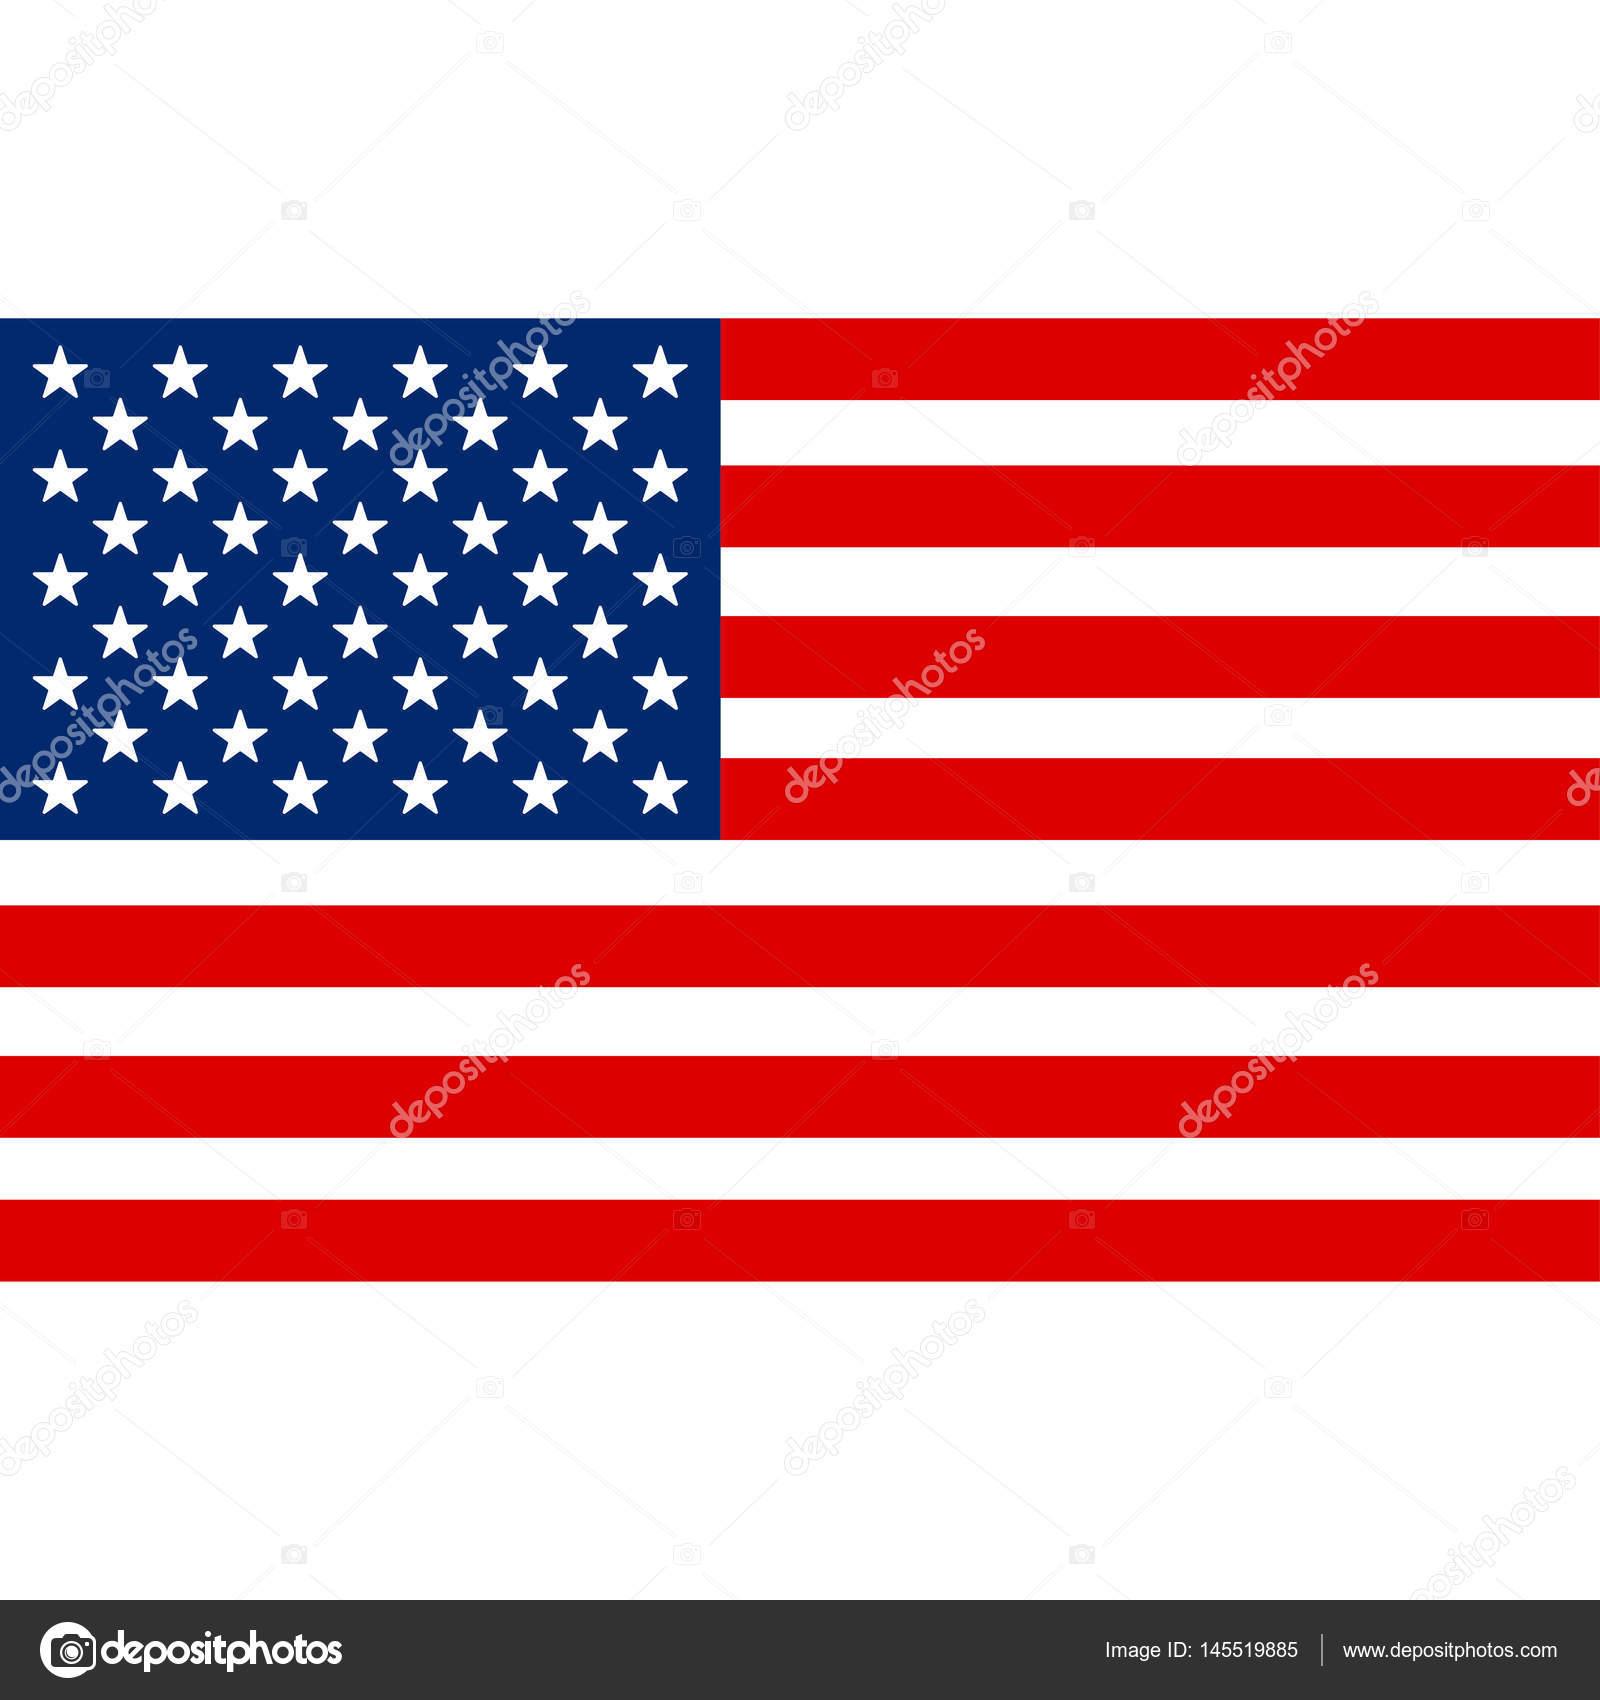 1600x1700 American Flag Image. American Flag Drawing Jpg. American Flag